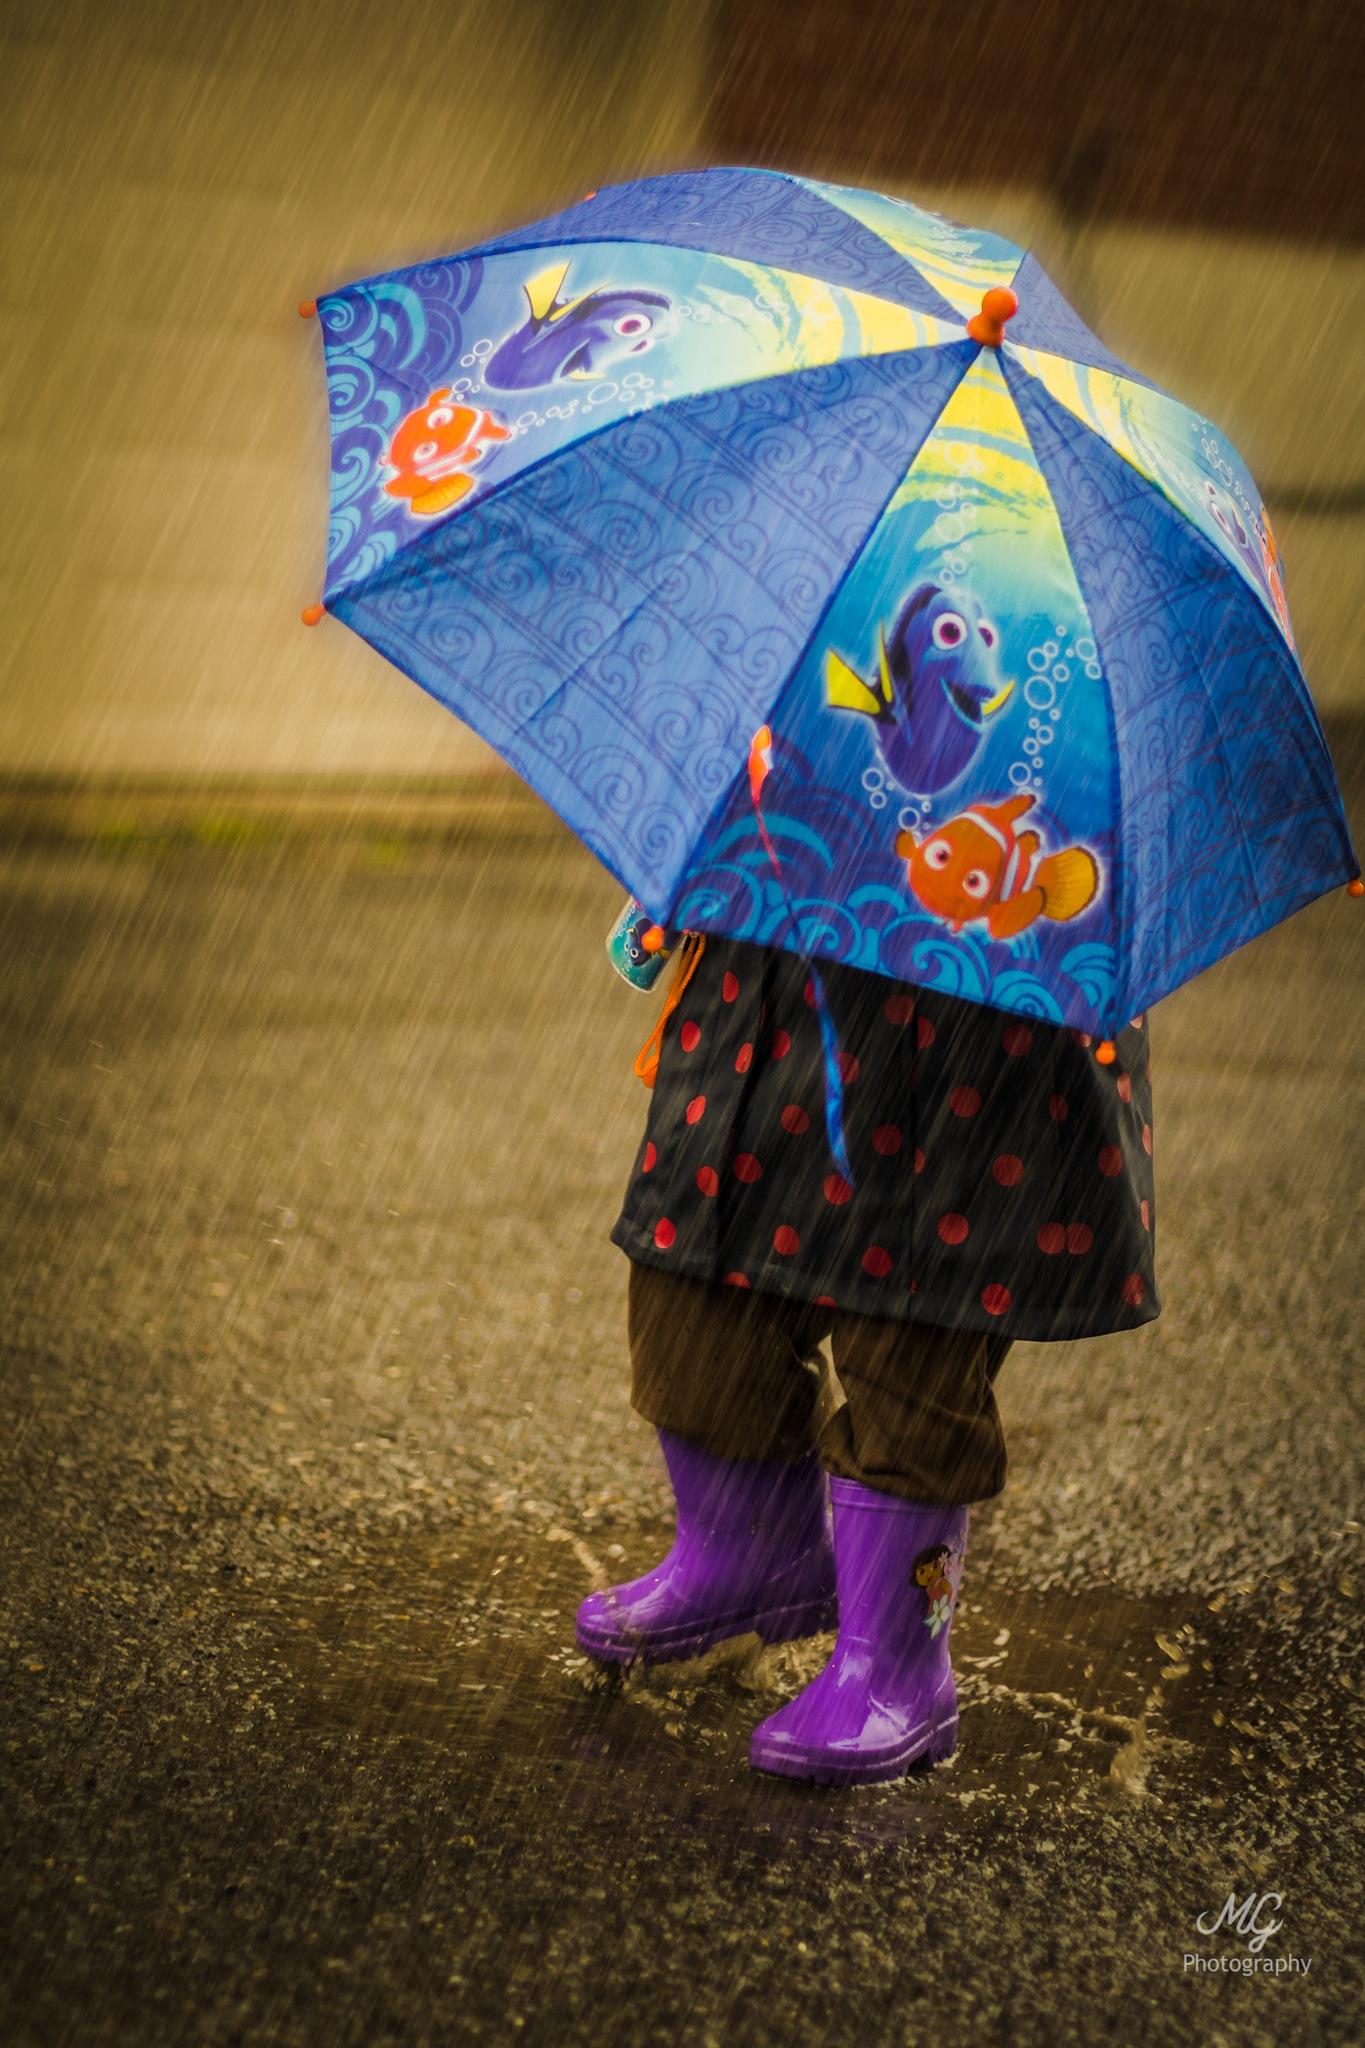 It's only rain on fun days by mickie gordon